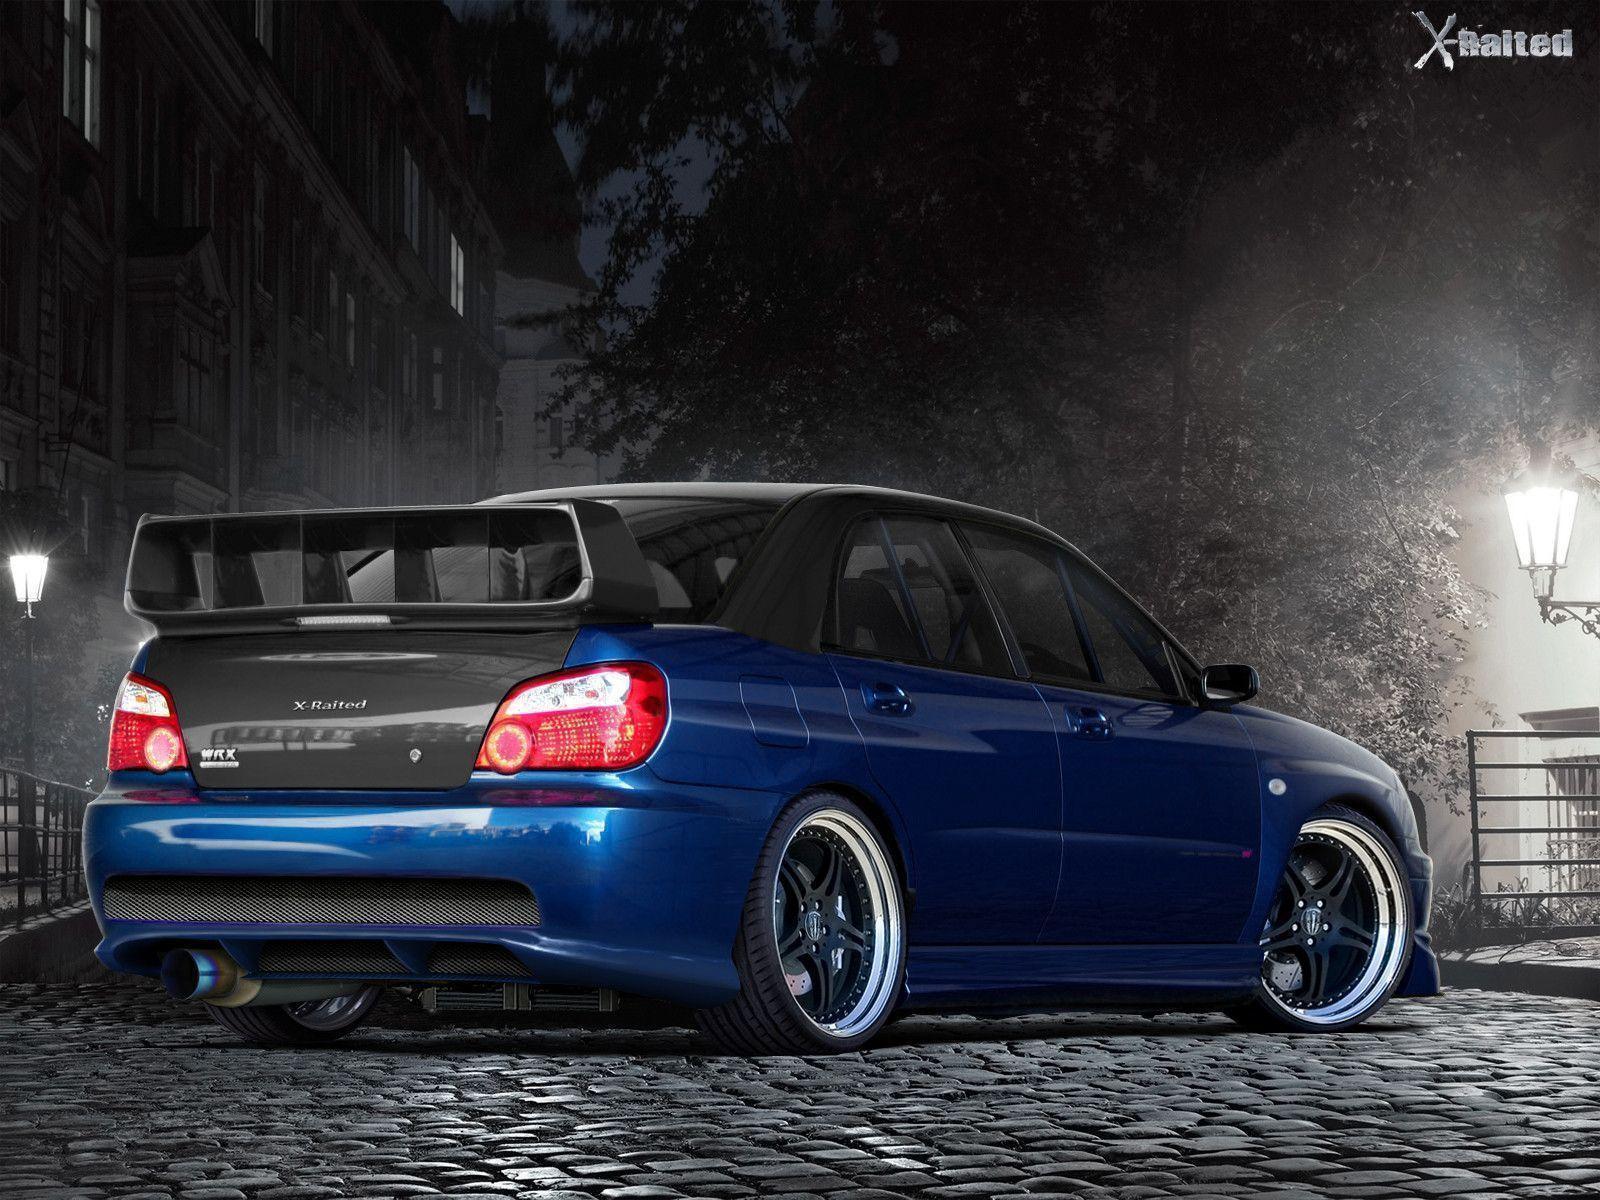 Subaru Wrx 0 60 >> Subaru Impreza Wallpapers - Wallpaper Cave